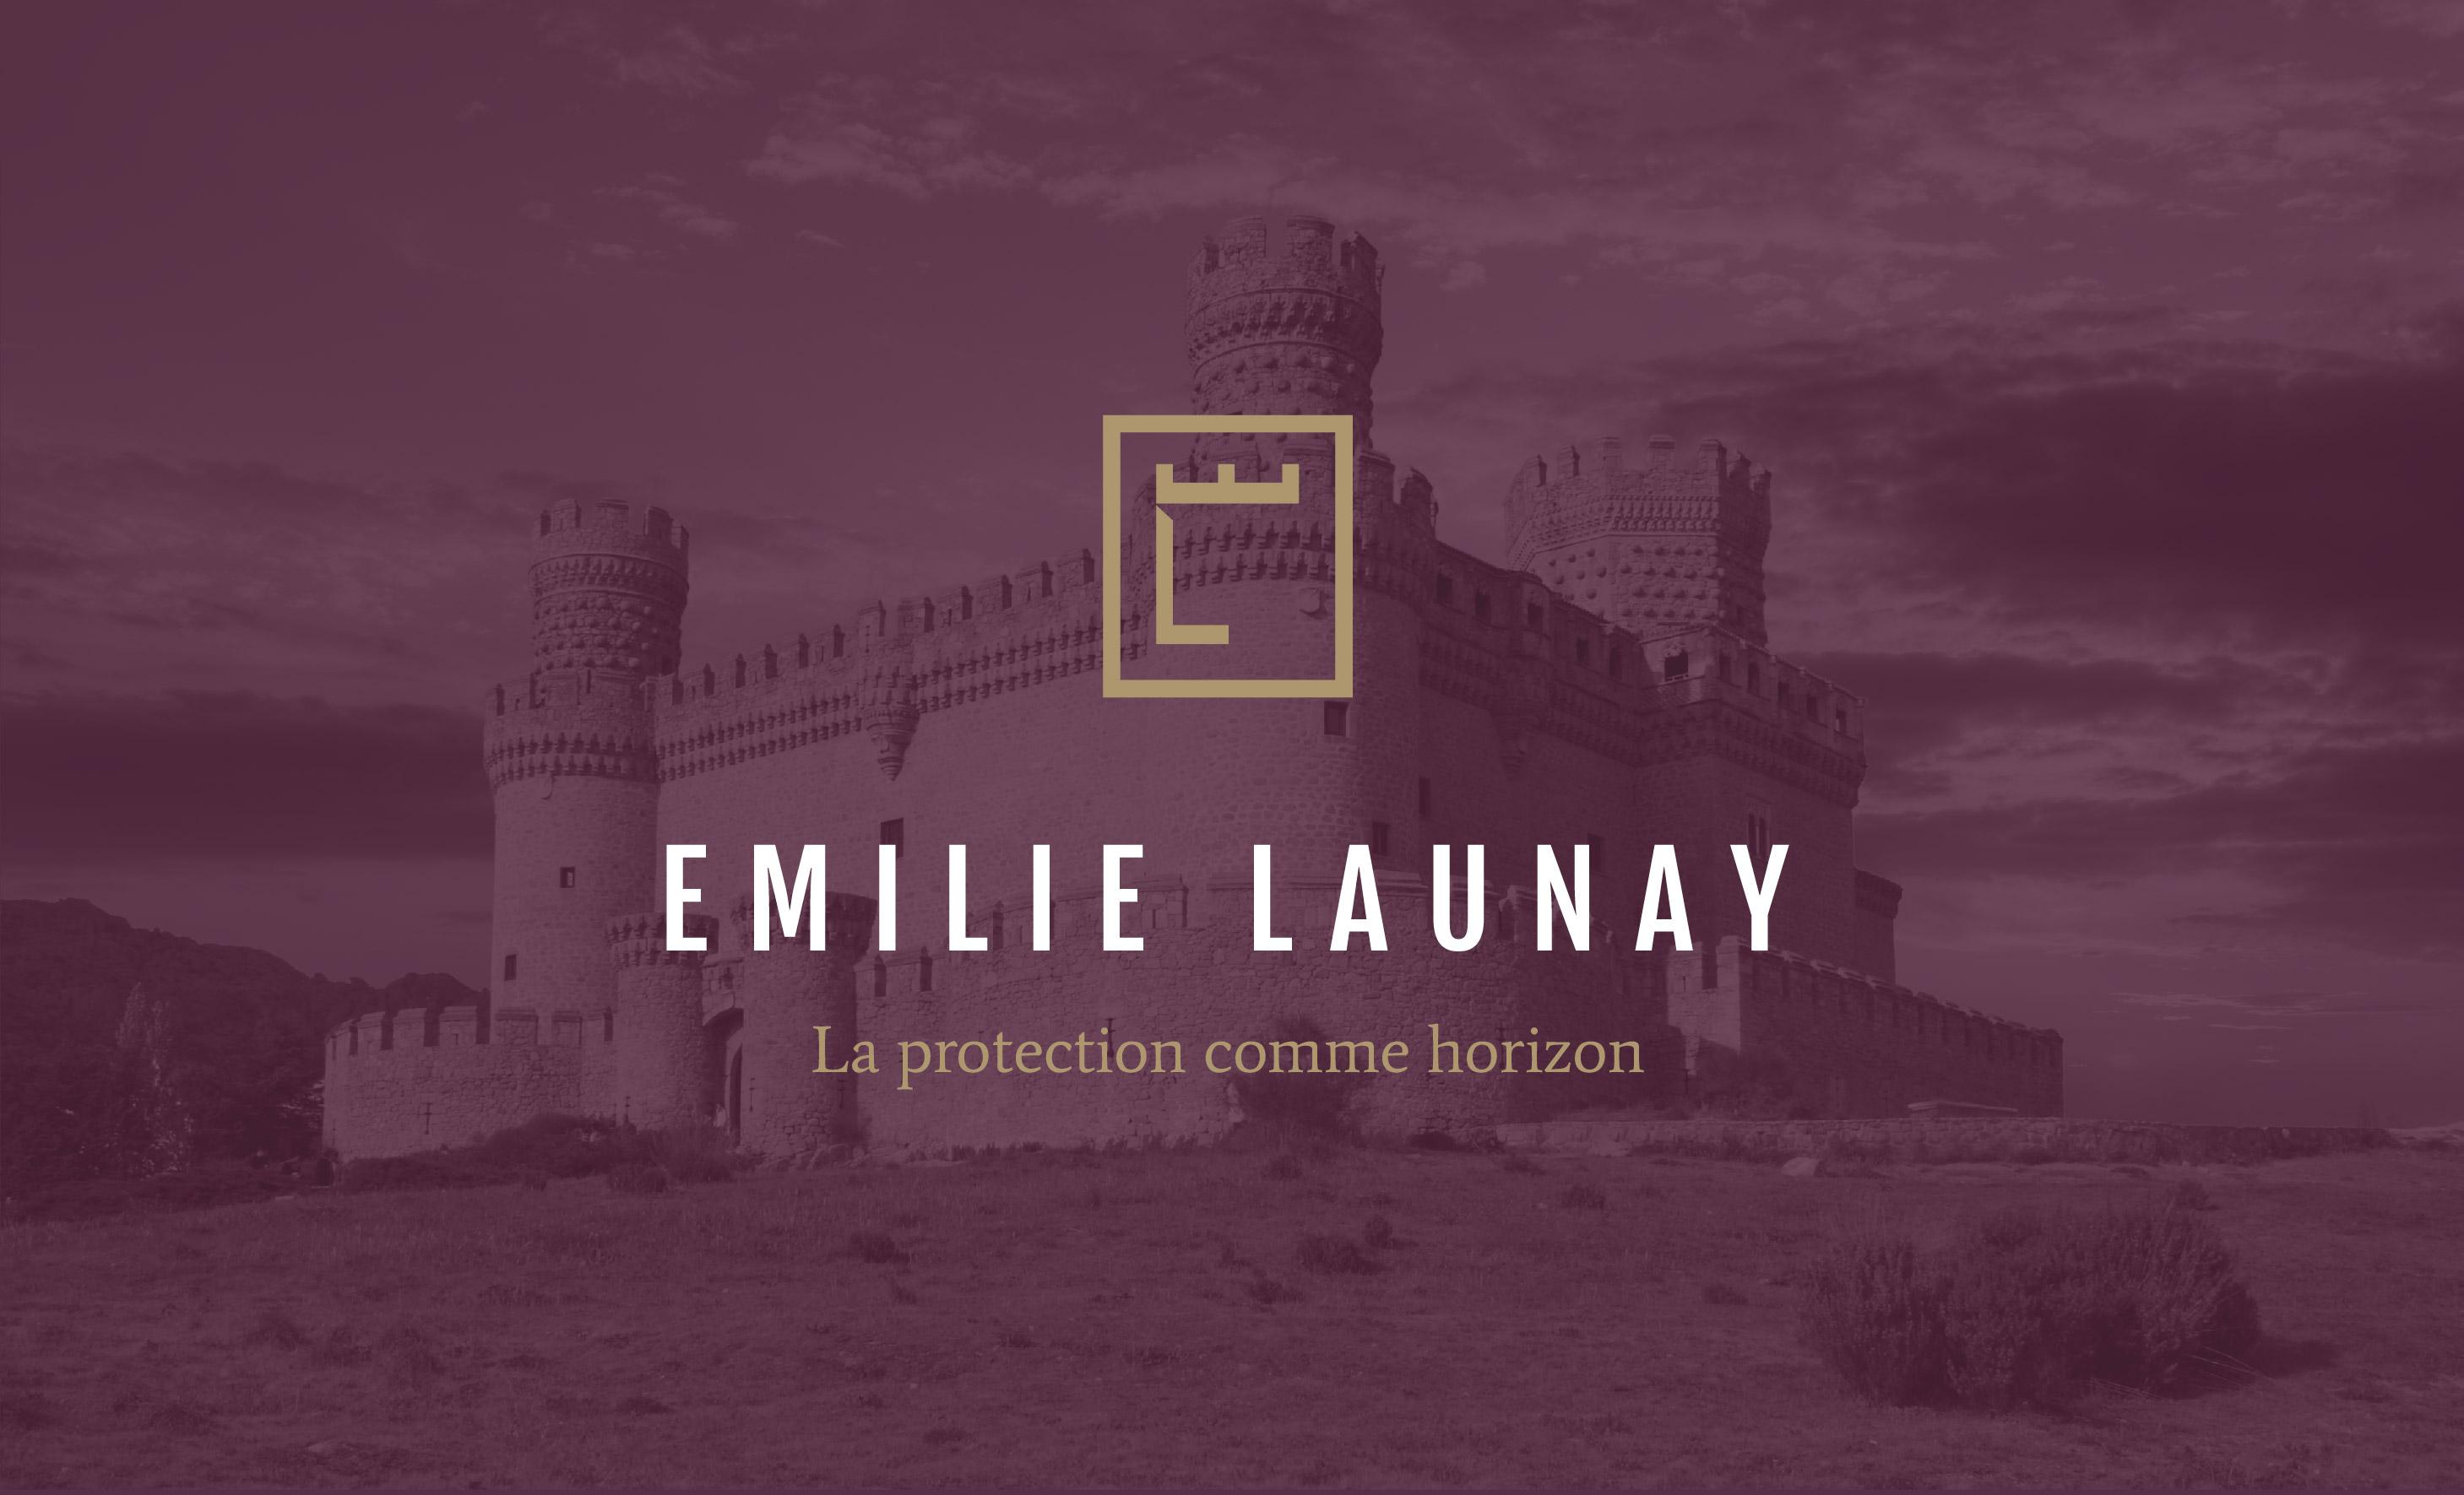 emilie-launay-branding-tablette